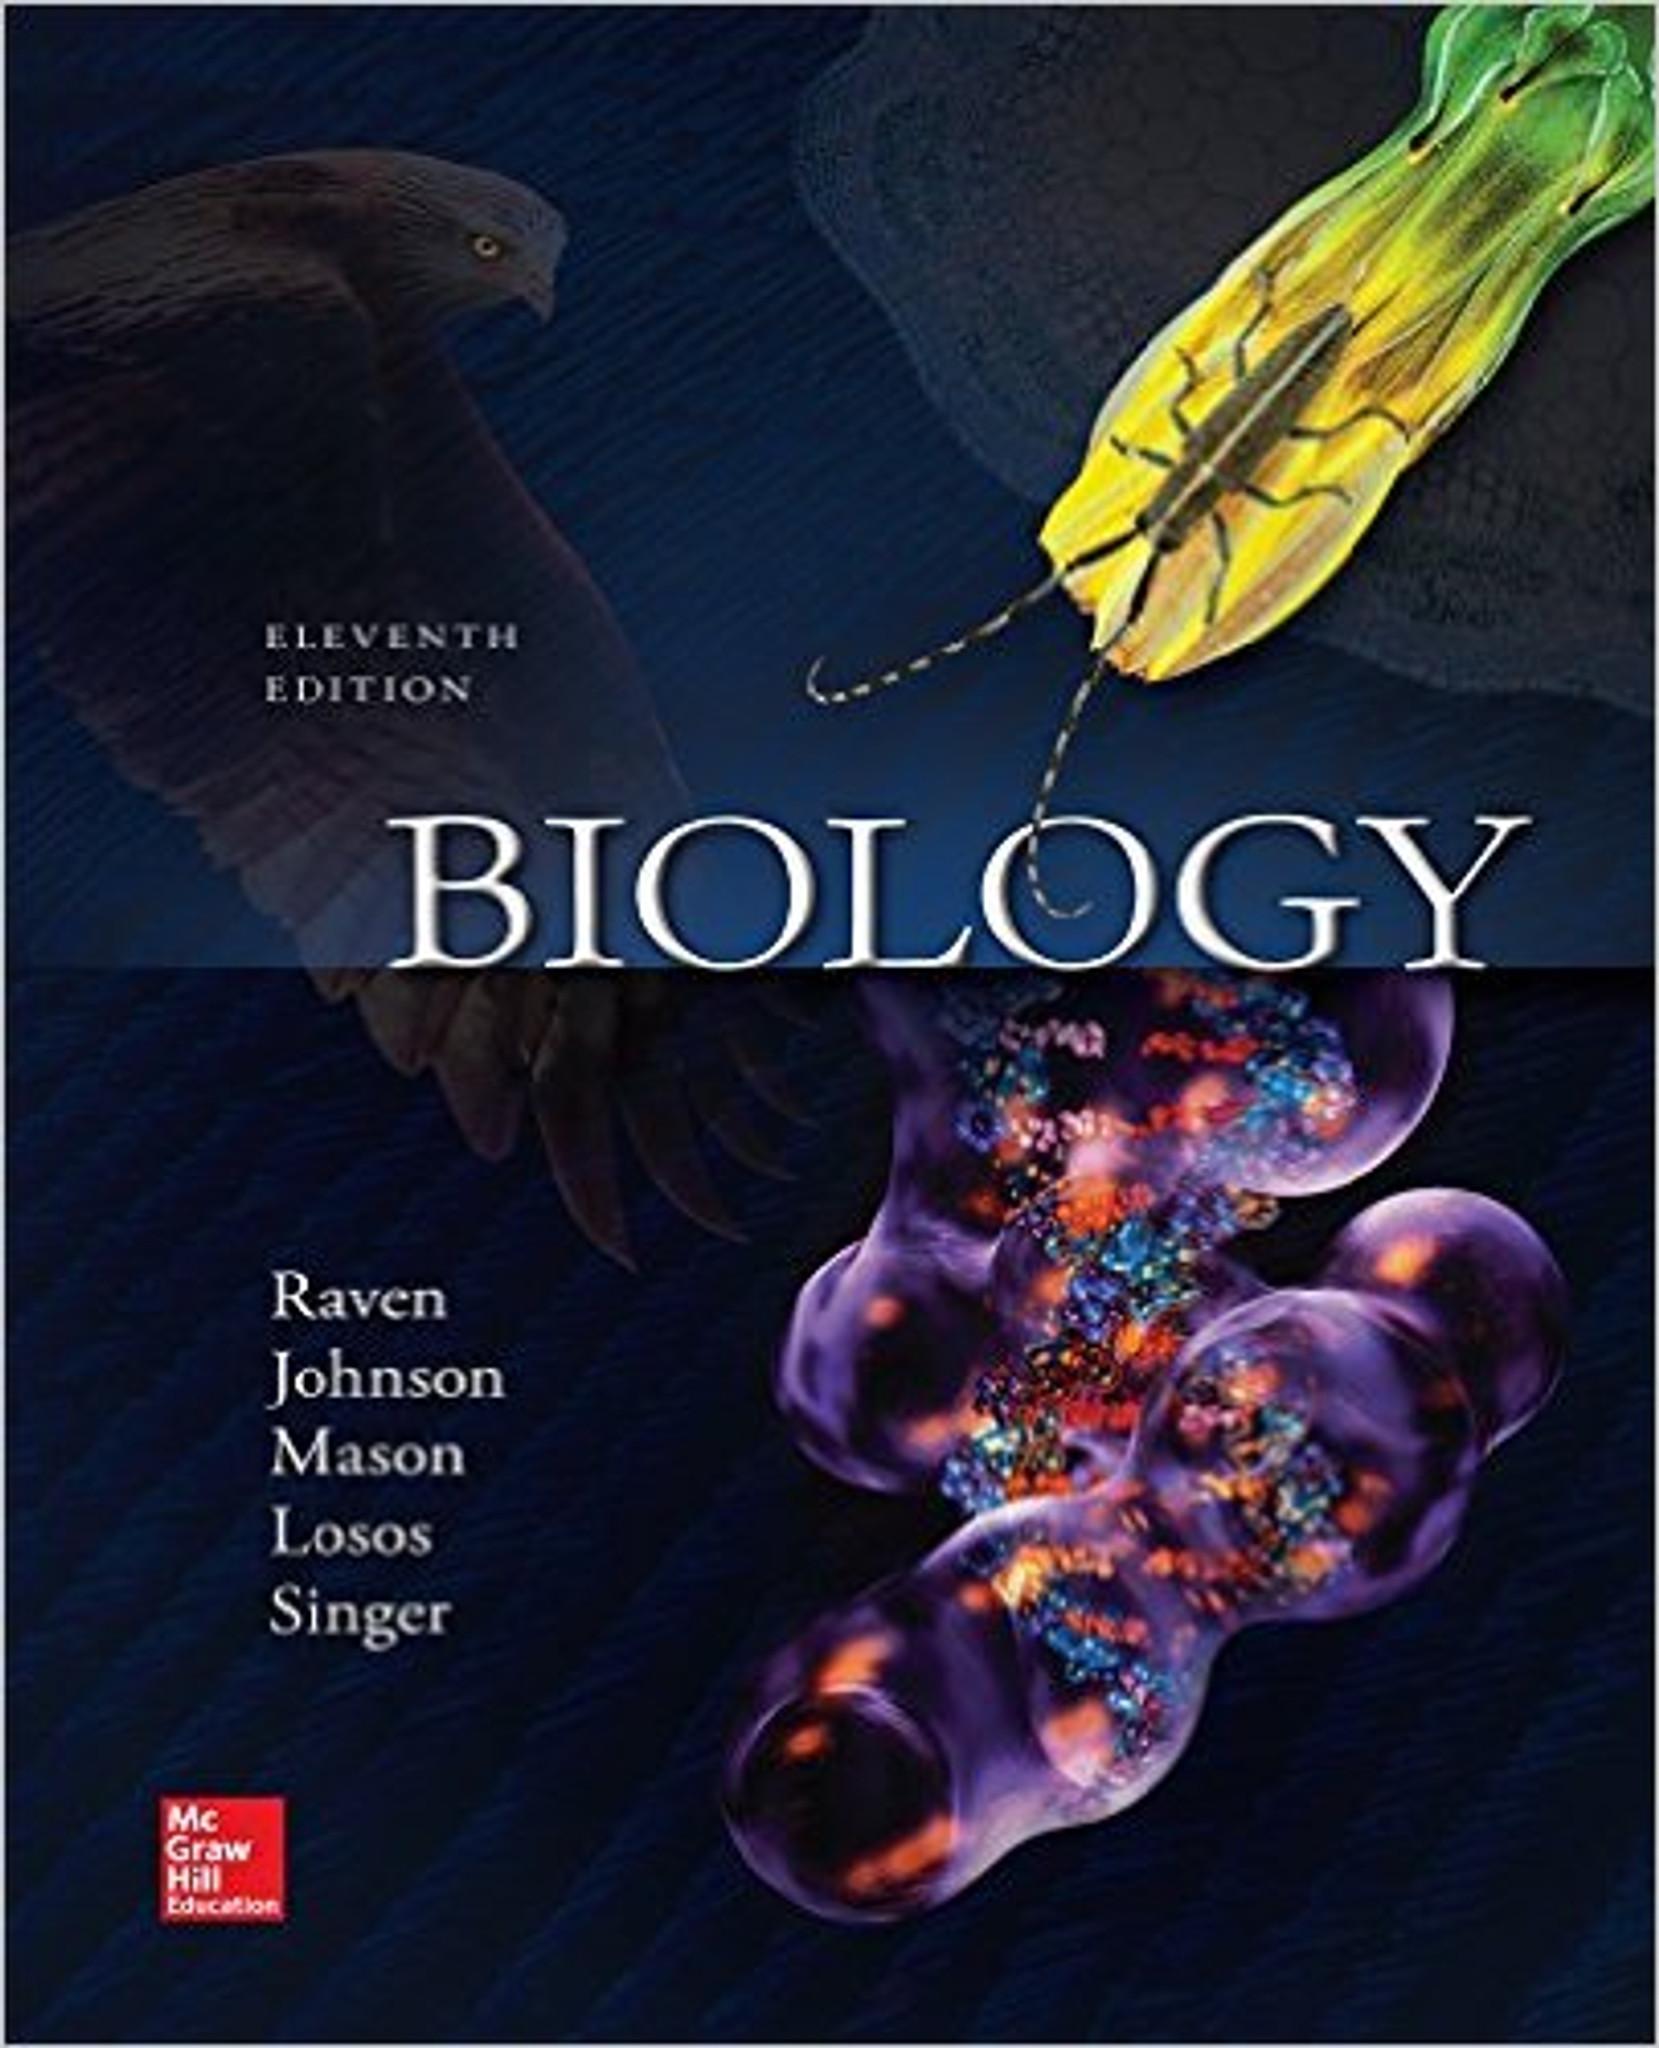 Image result for raven biology 11th edition